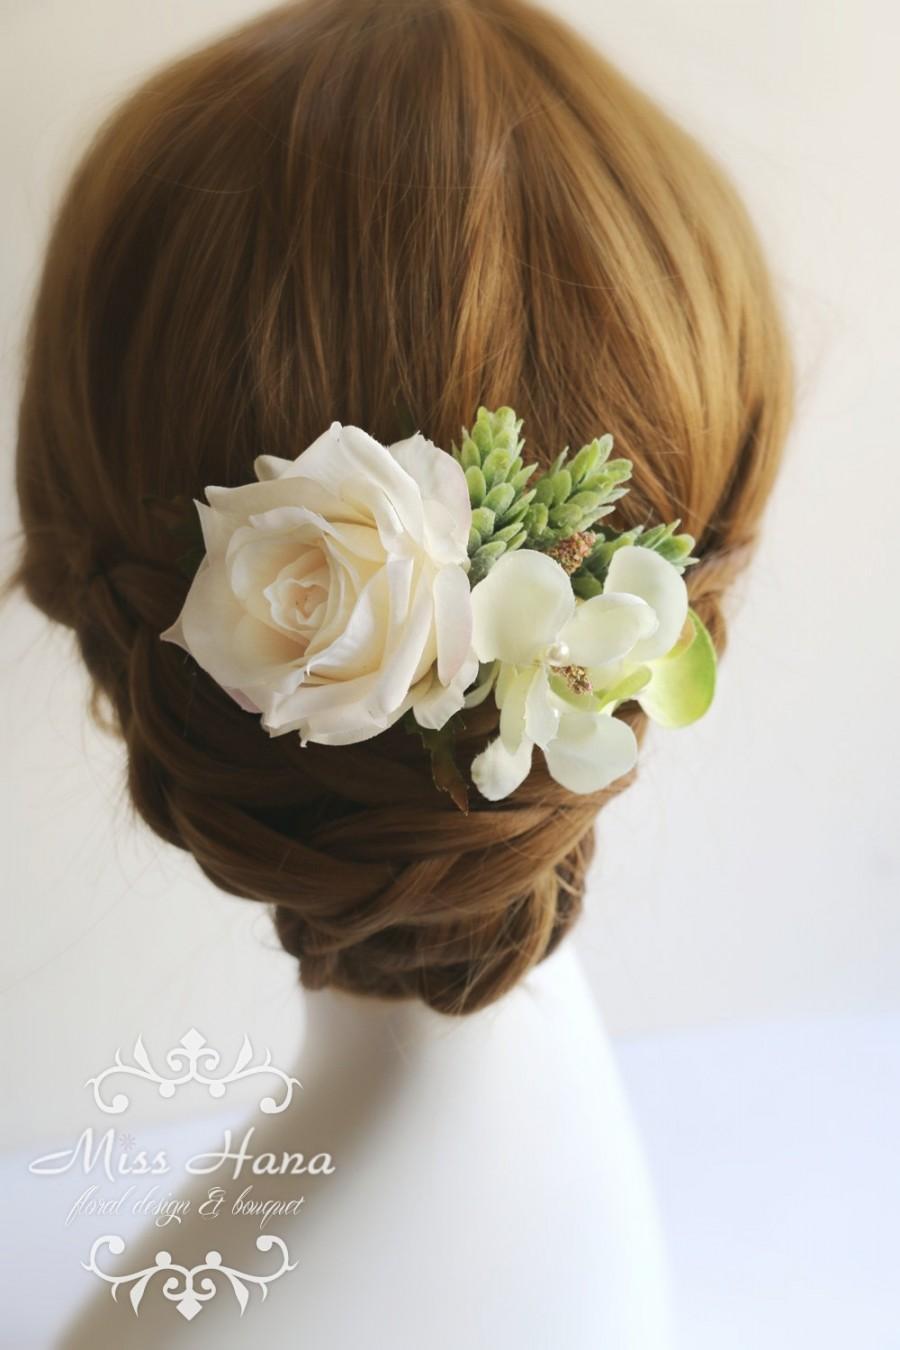 زفاف - Bridal Hair Accessory, ivory rose green wild flowers, Bridal Hair comb hairpiece flower, Bridesmaid Rustic Vintage outdoor wedding woodland